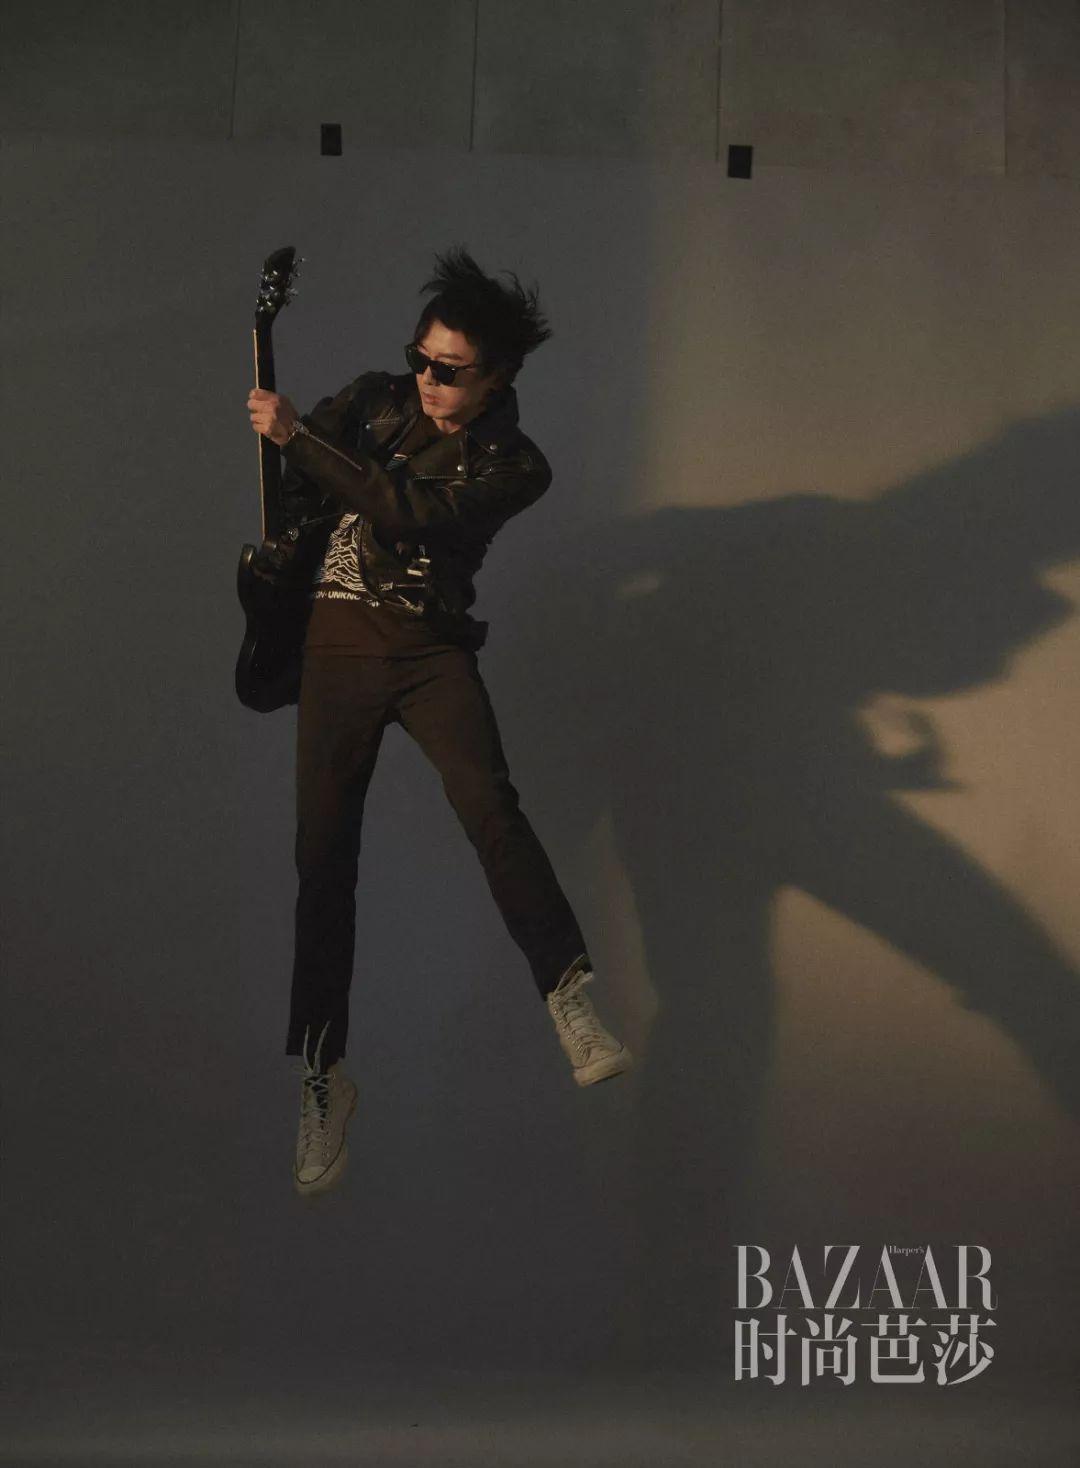 bazaar 乐队的夏天:音乐是道平凡生活的皎皎月光图片